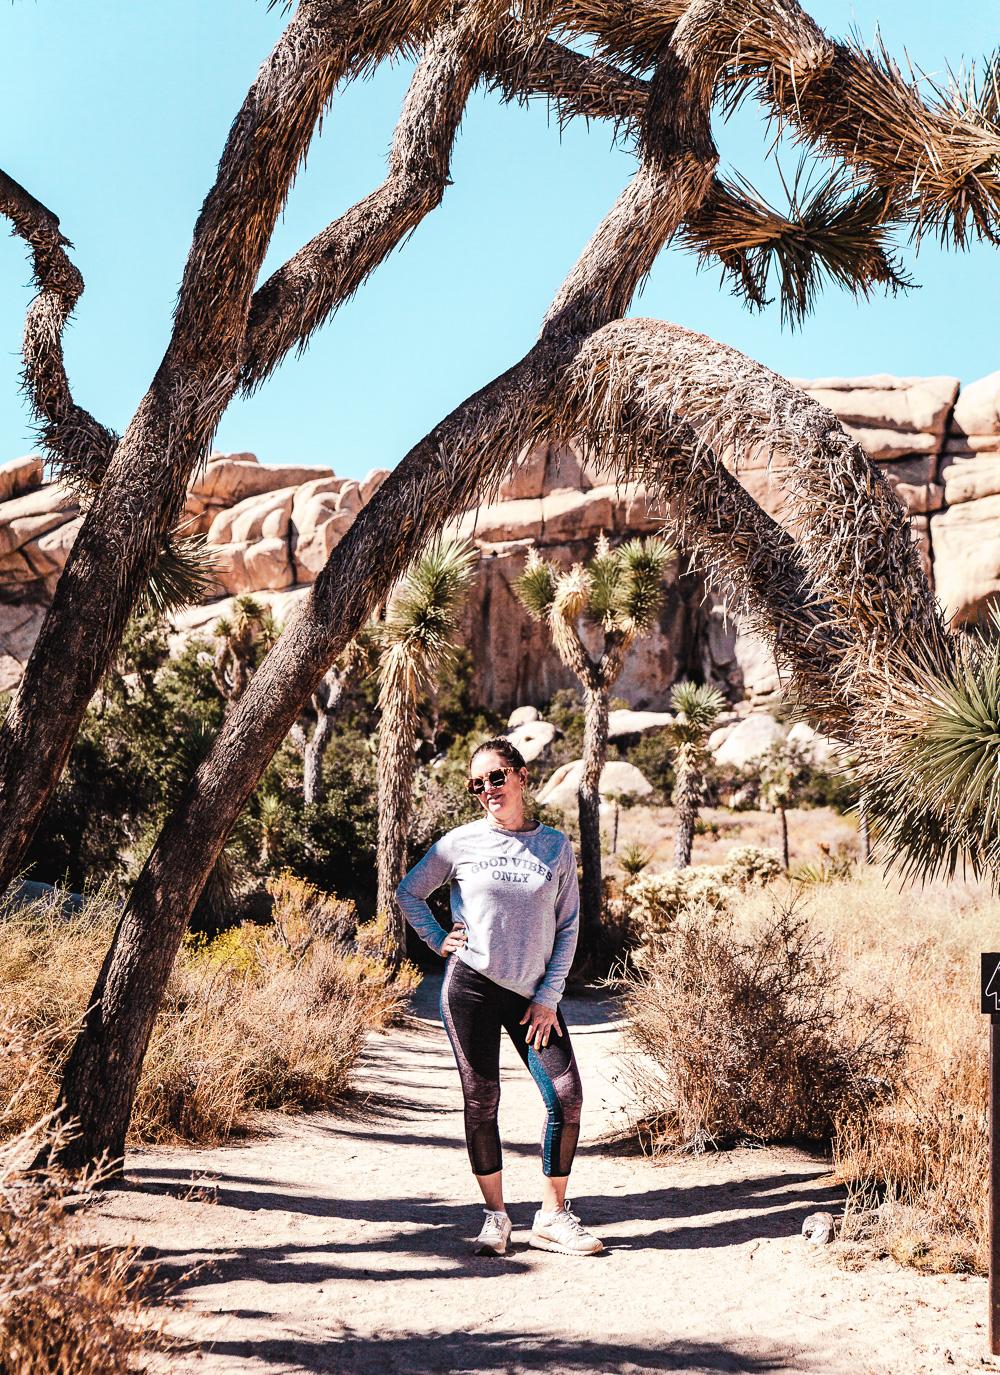 A visual travelogue of Joshua Tree, CA by Los Angeles photographer Sarah Ehlinger